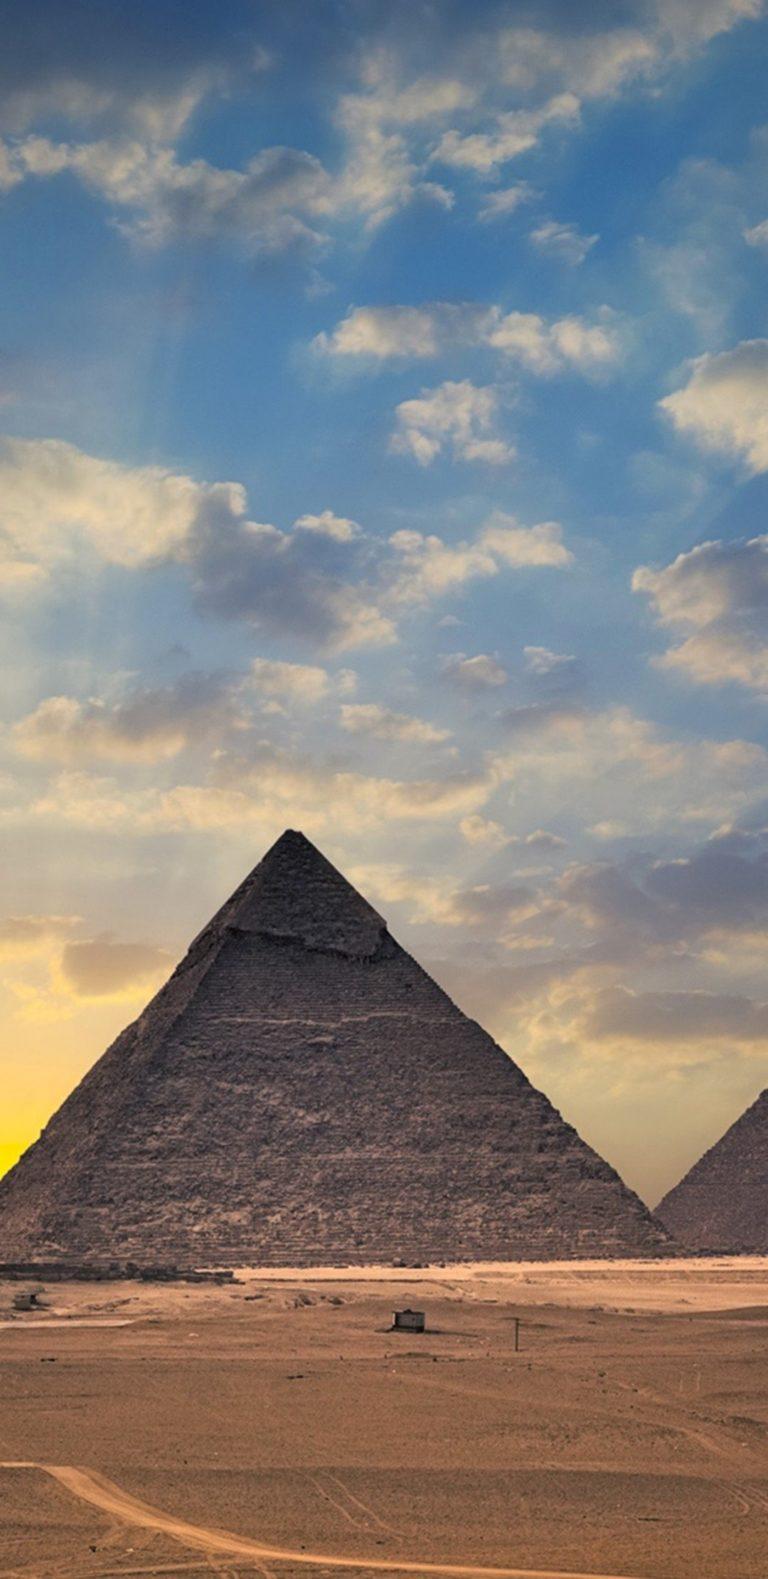 Egypt Pyramids Monument 1080x2220 768x1579